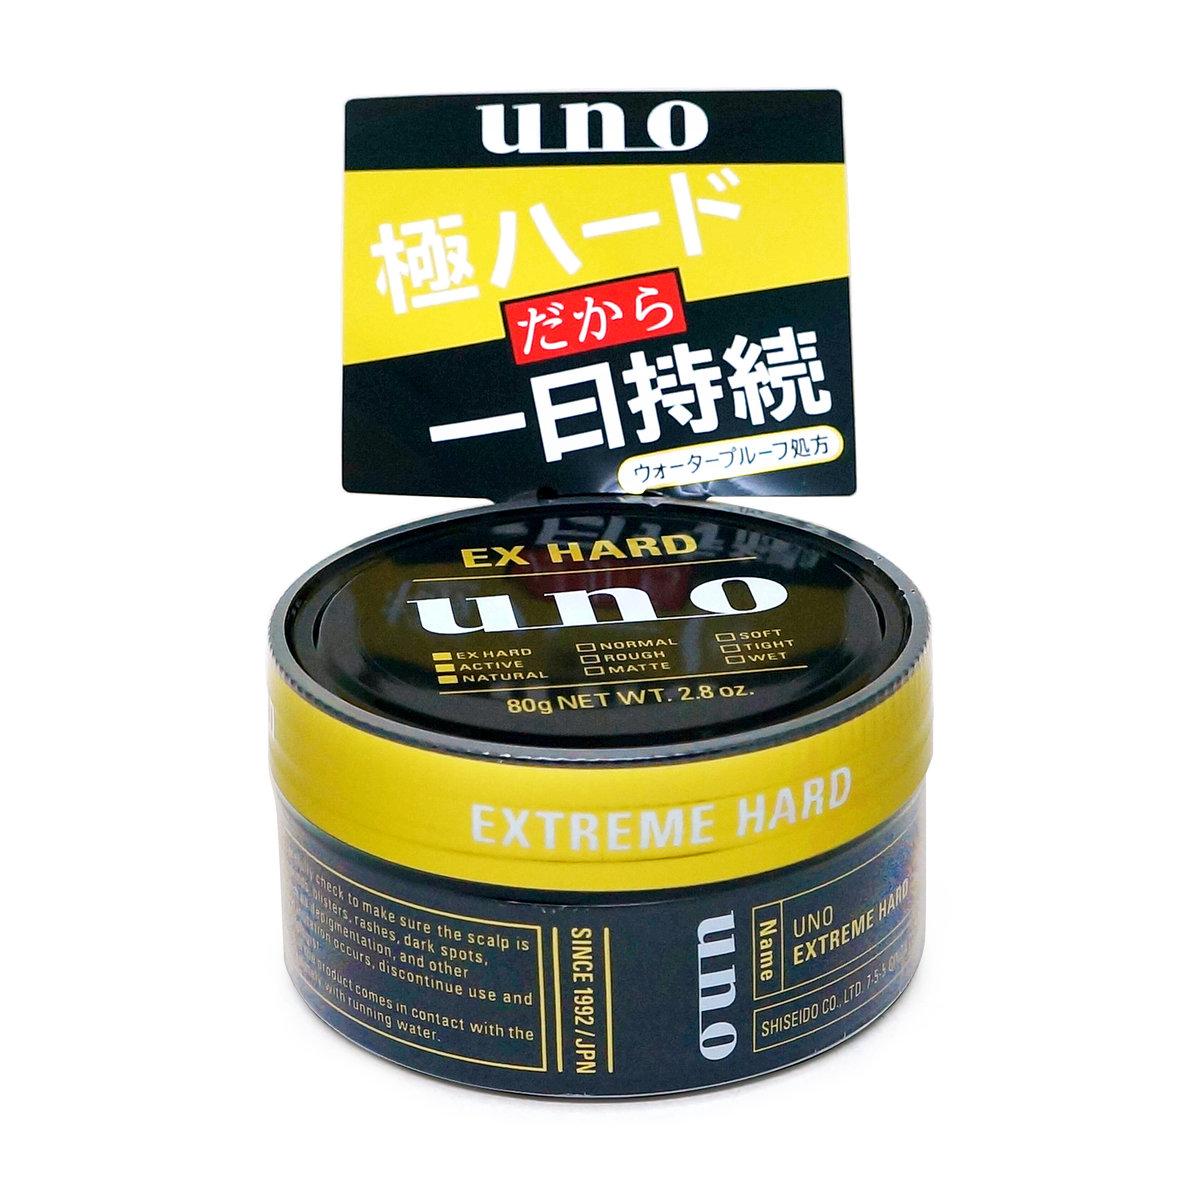 Shiseido UNO | UNO Extreme Hard Hair Wax 80g (4901872459964) | HKTVmall The  Largest HK Shopping Platform